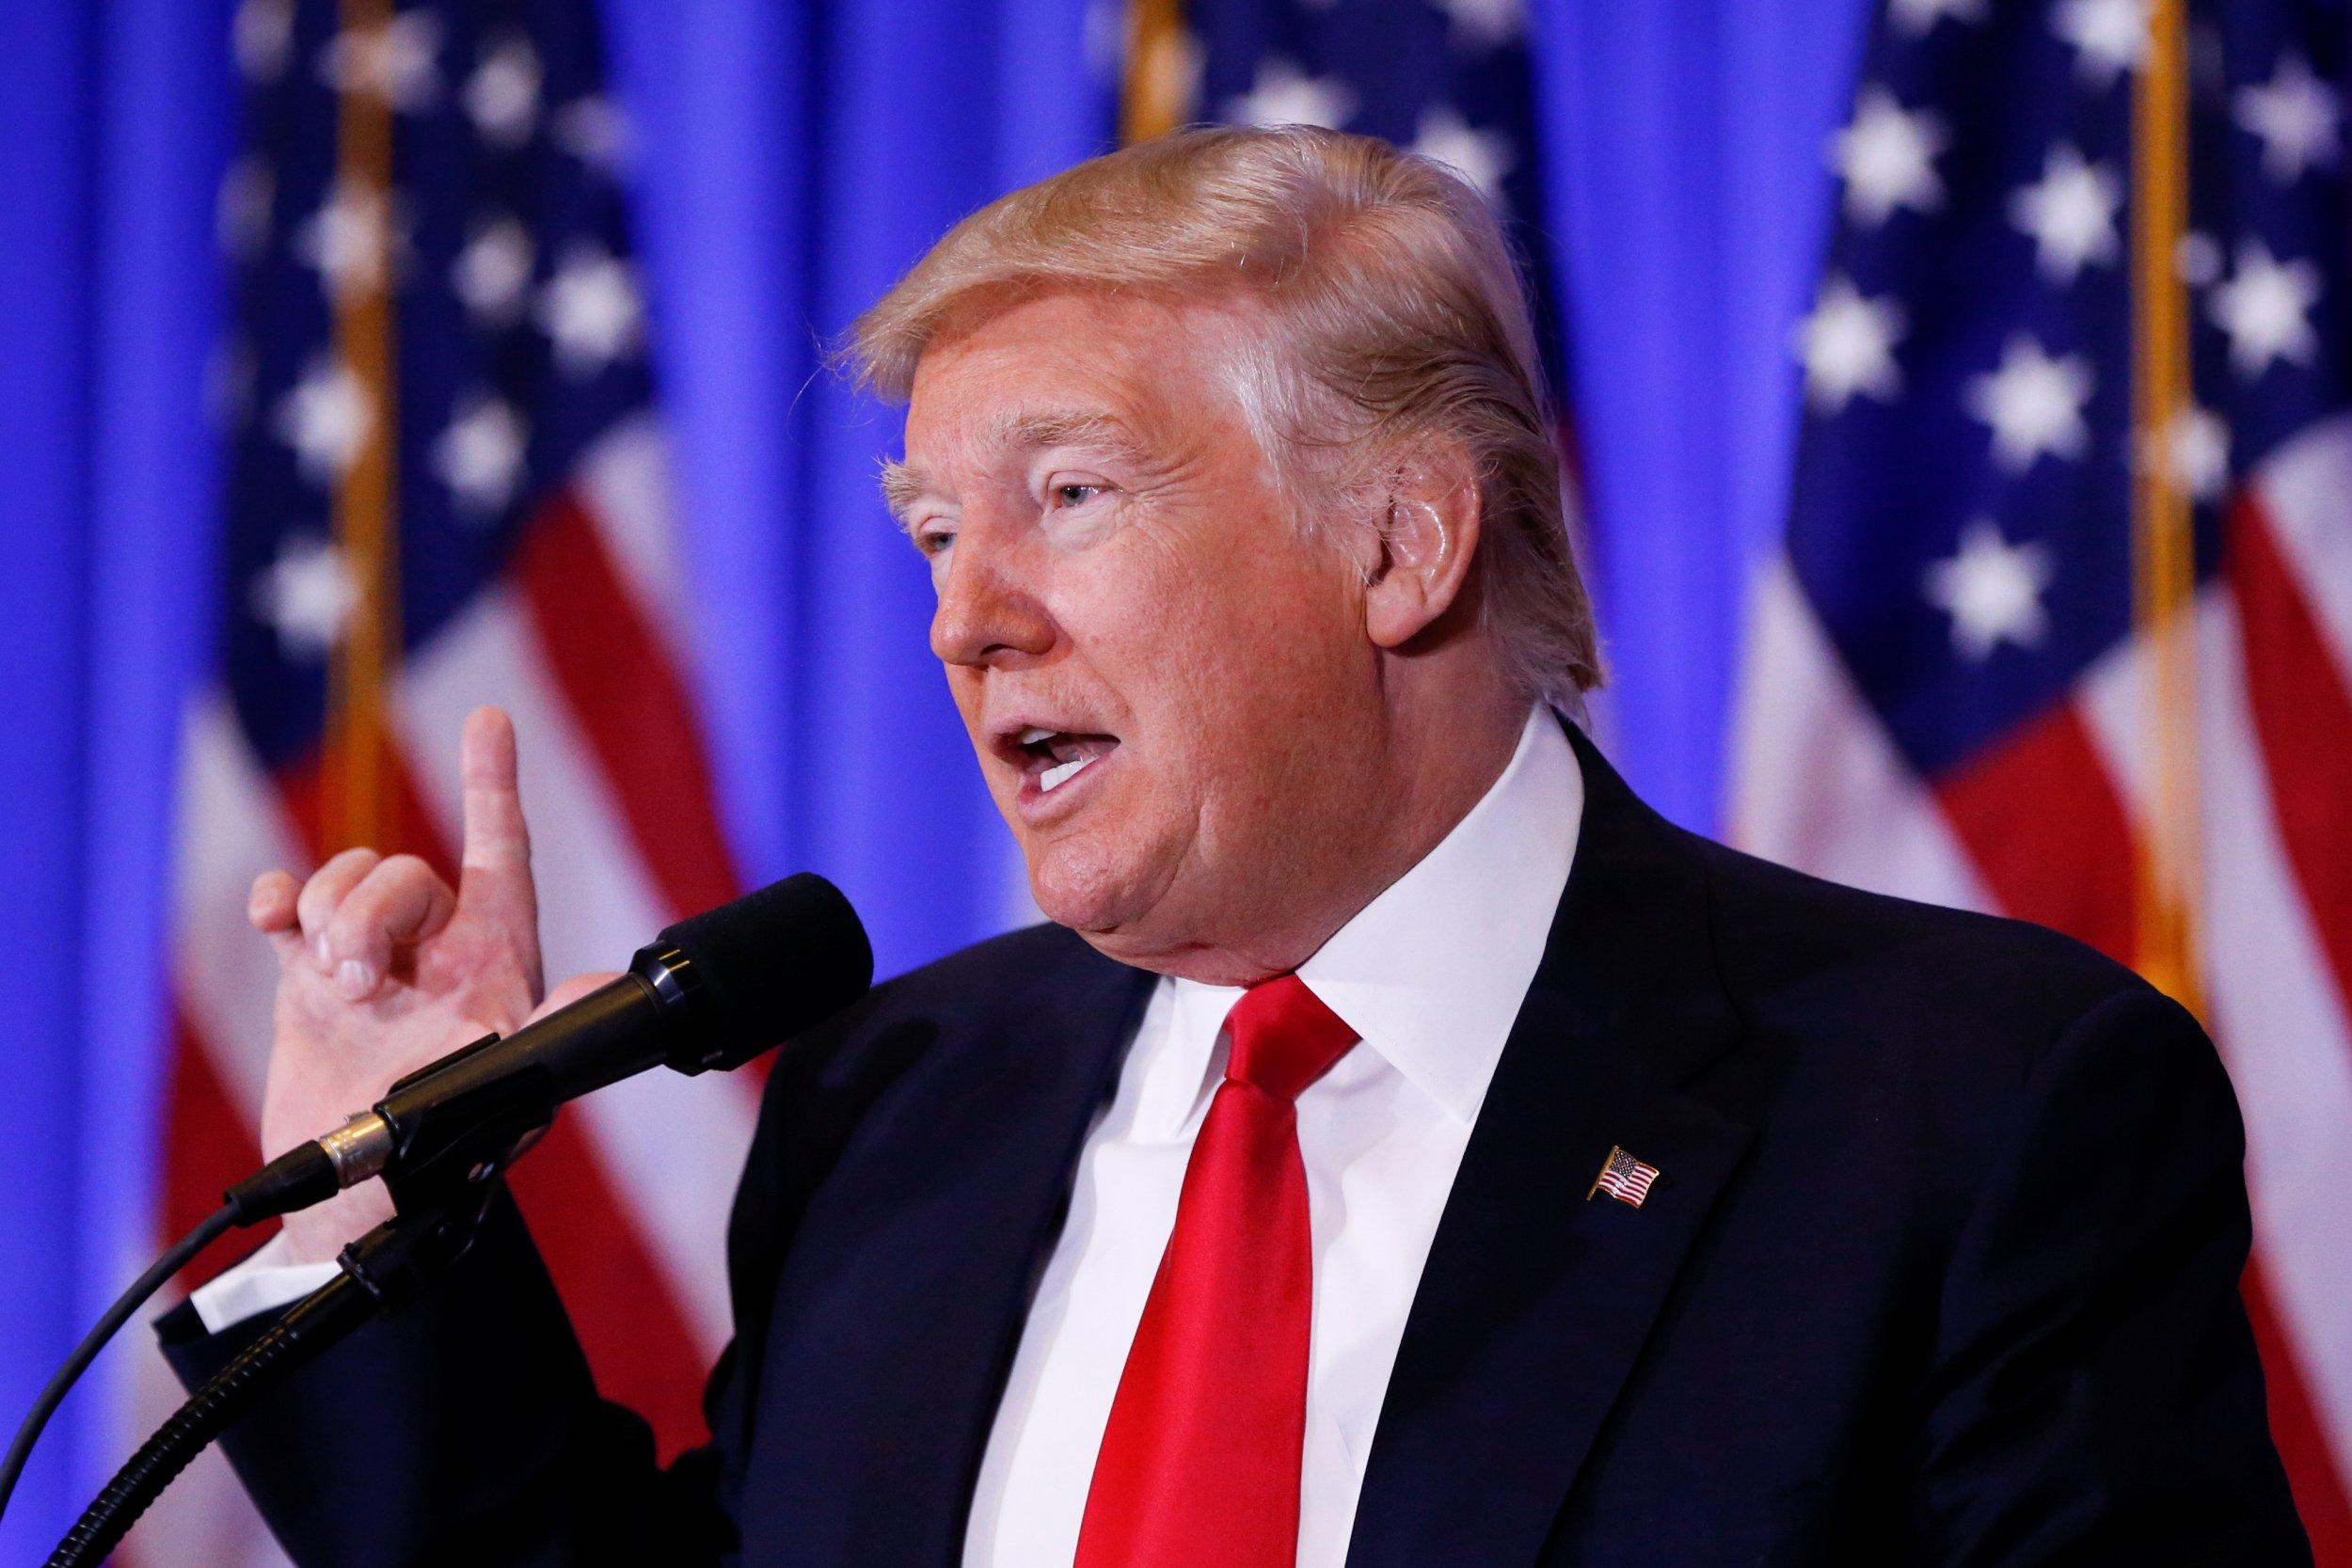 0216_Donald_Trump_press_conference_01